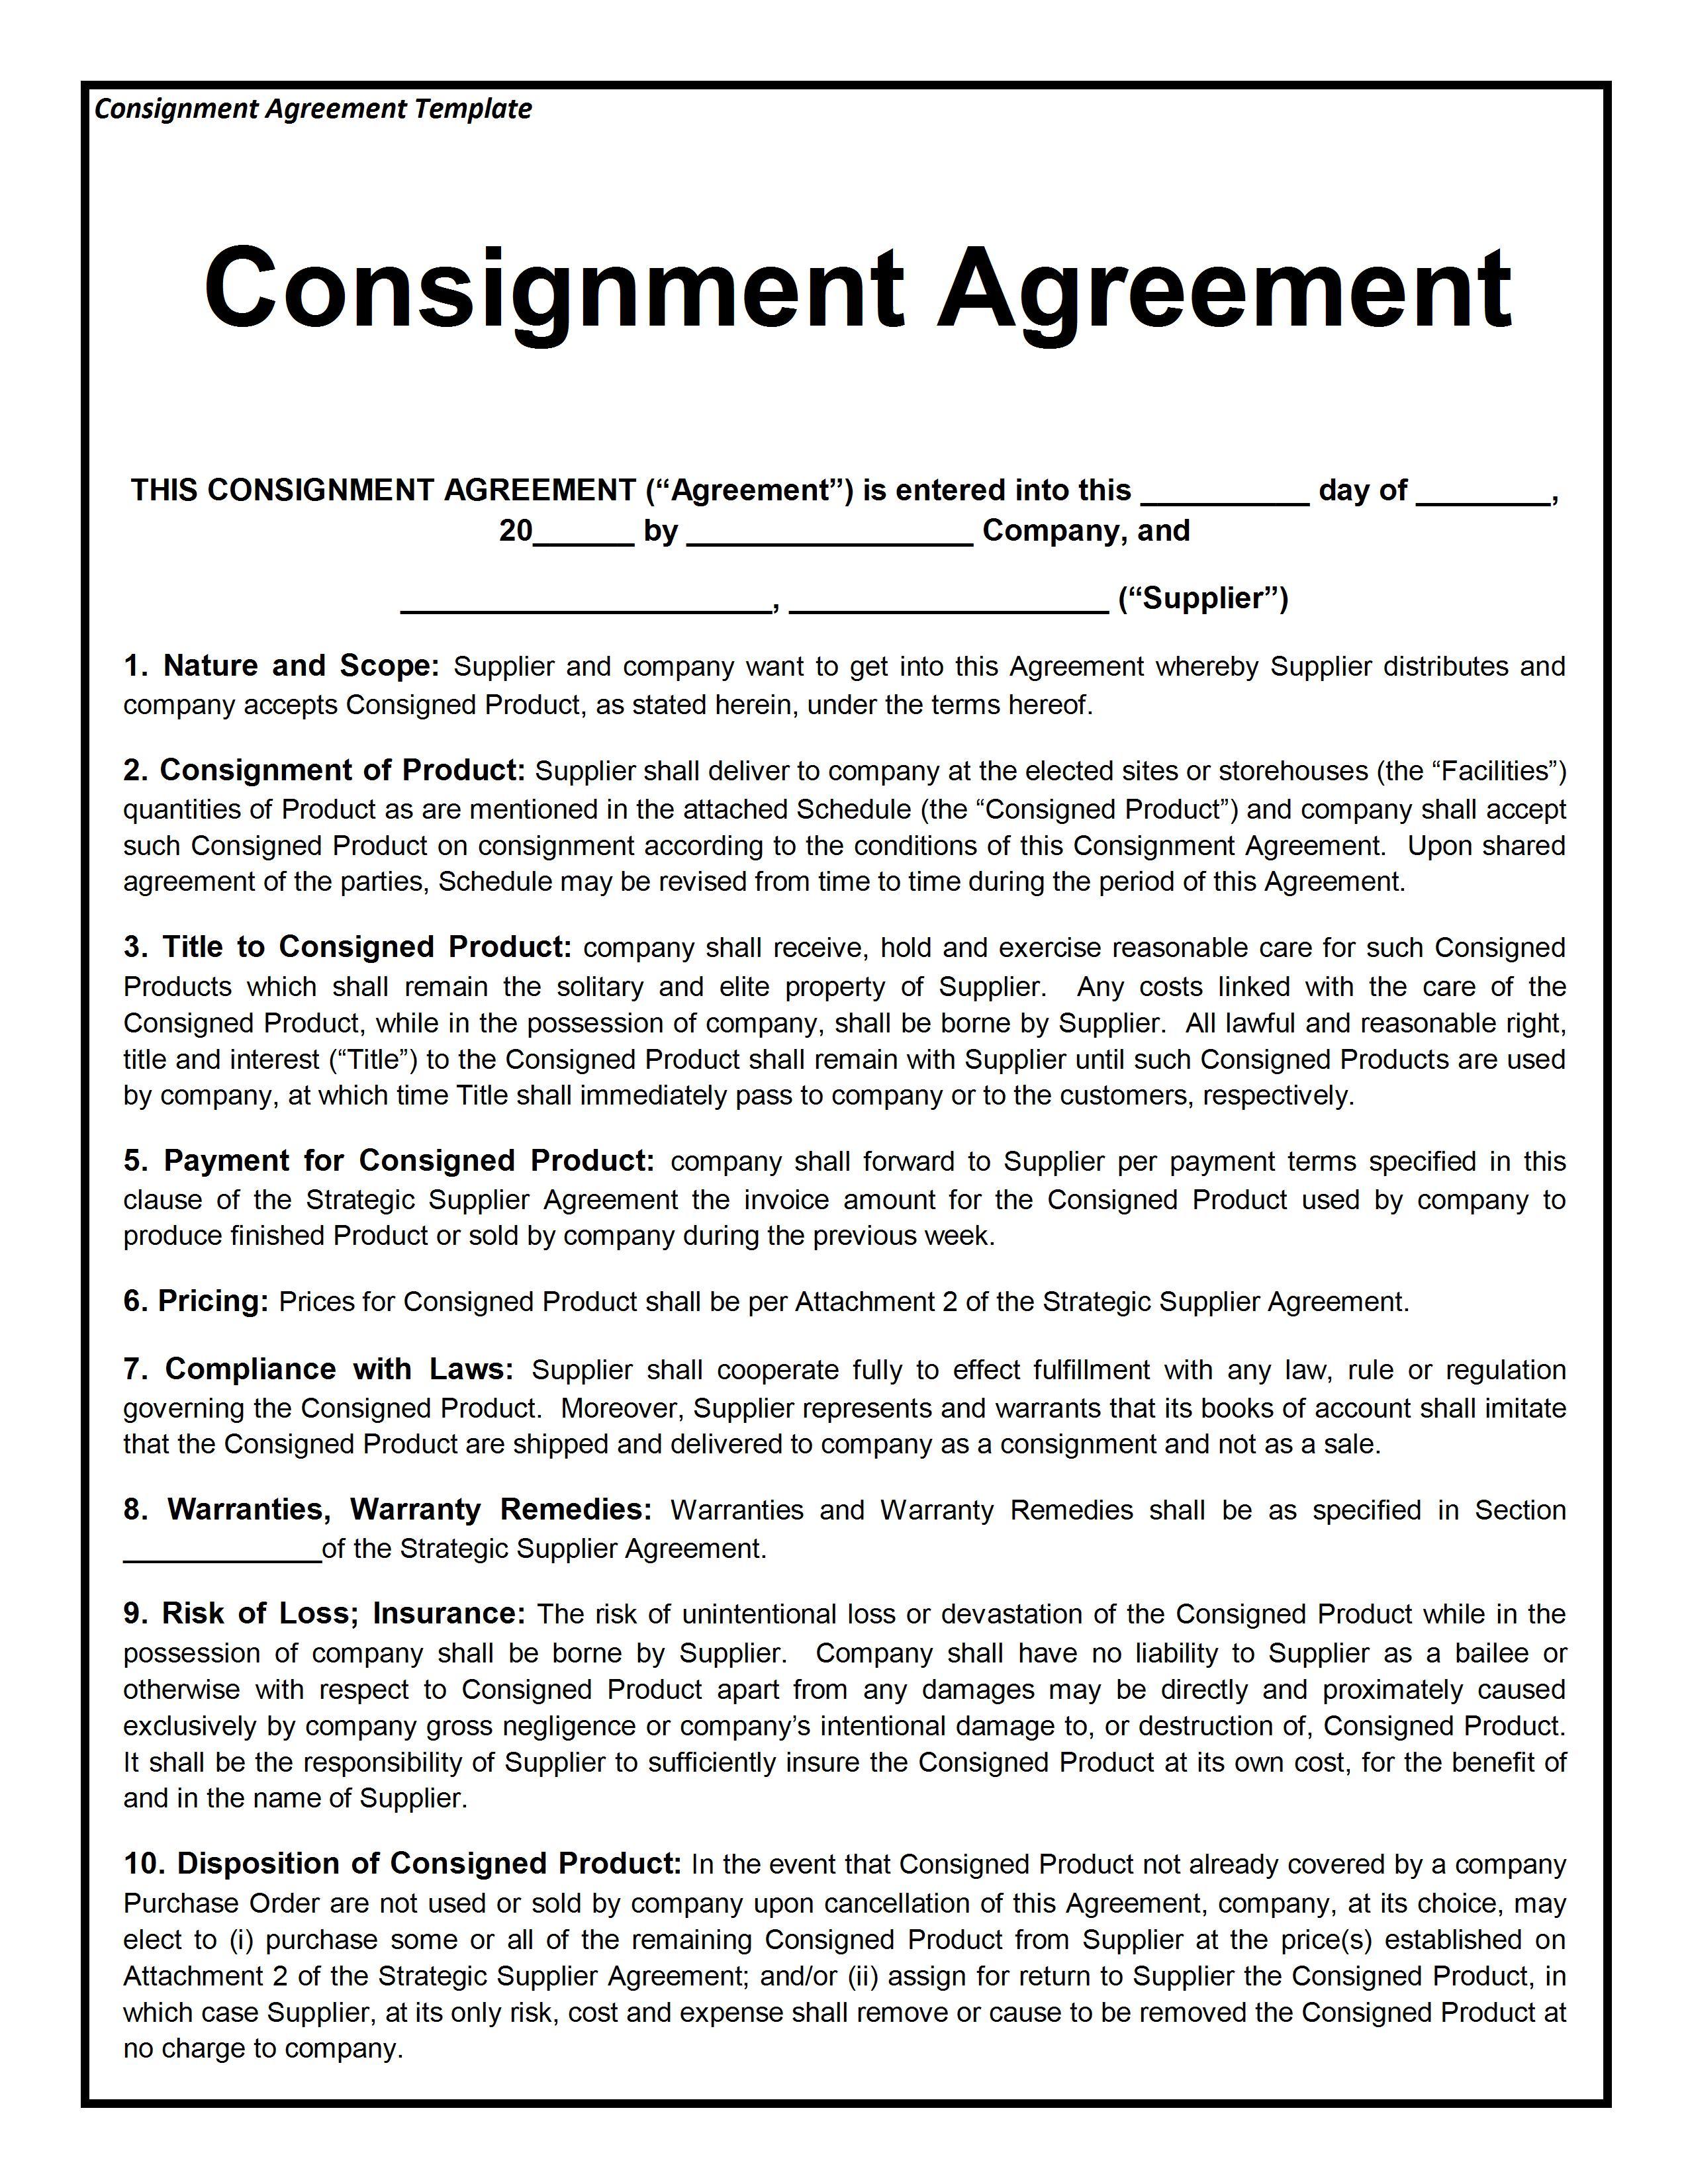 Artist Consignment Agreement Template